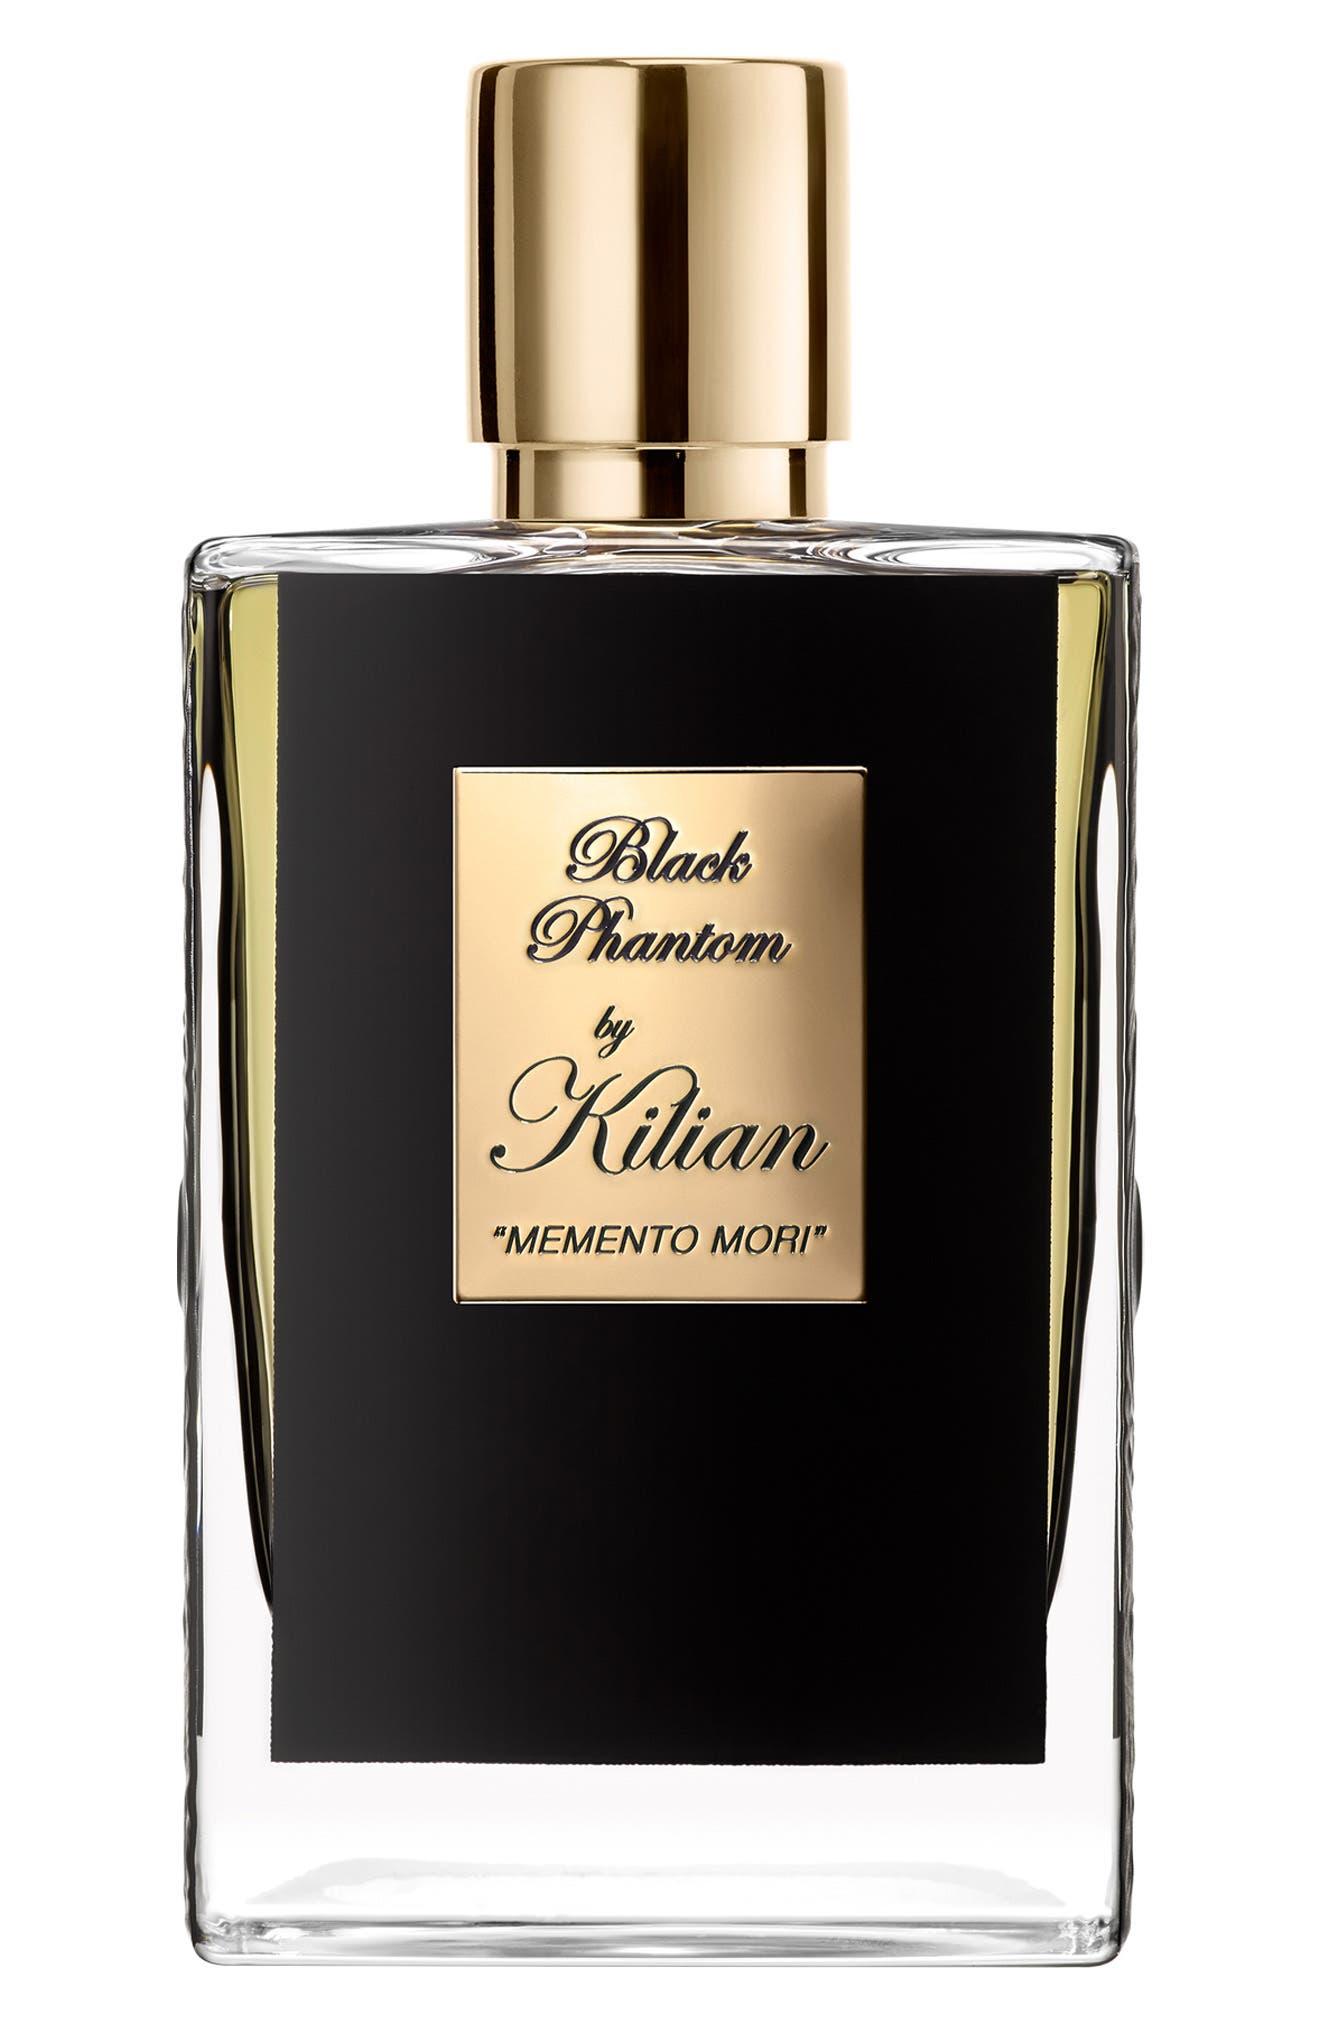 Cellars Black Phantom Memento Mori Refillable Perfume